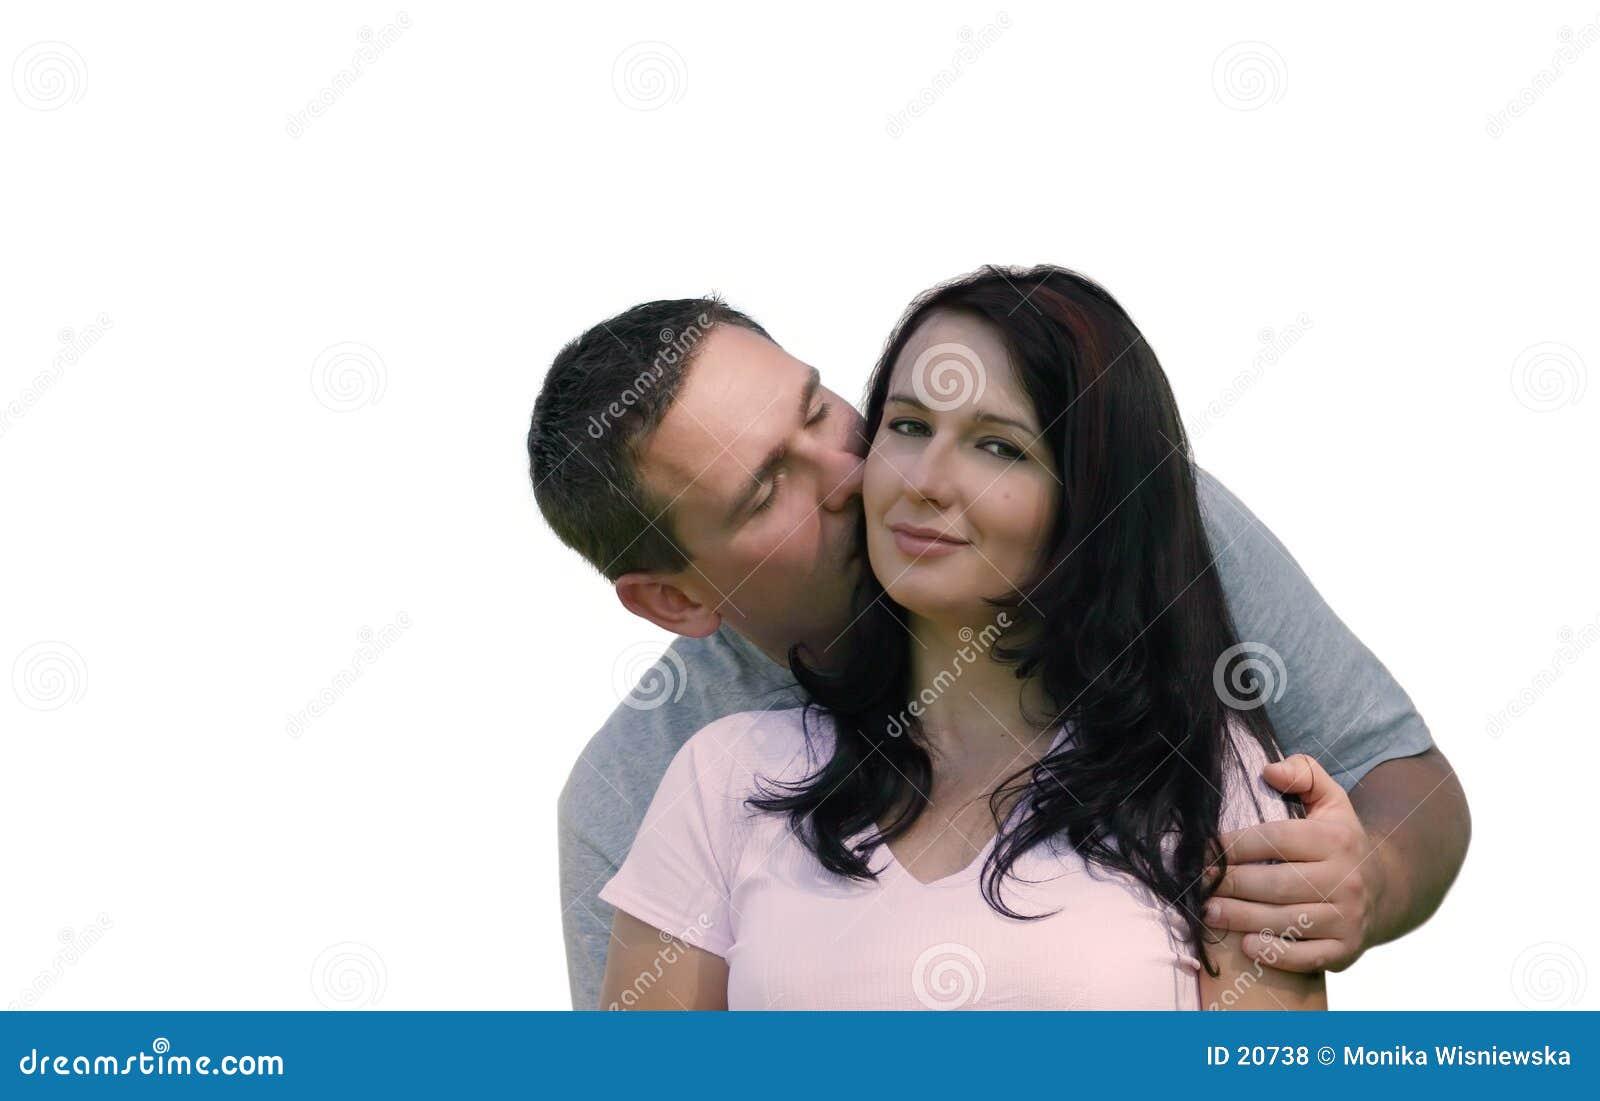 Leute - süßer Kuss